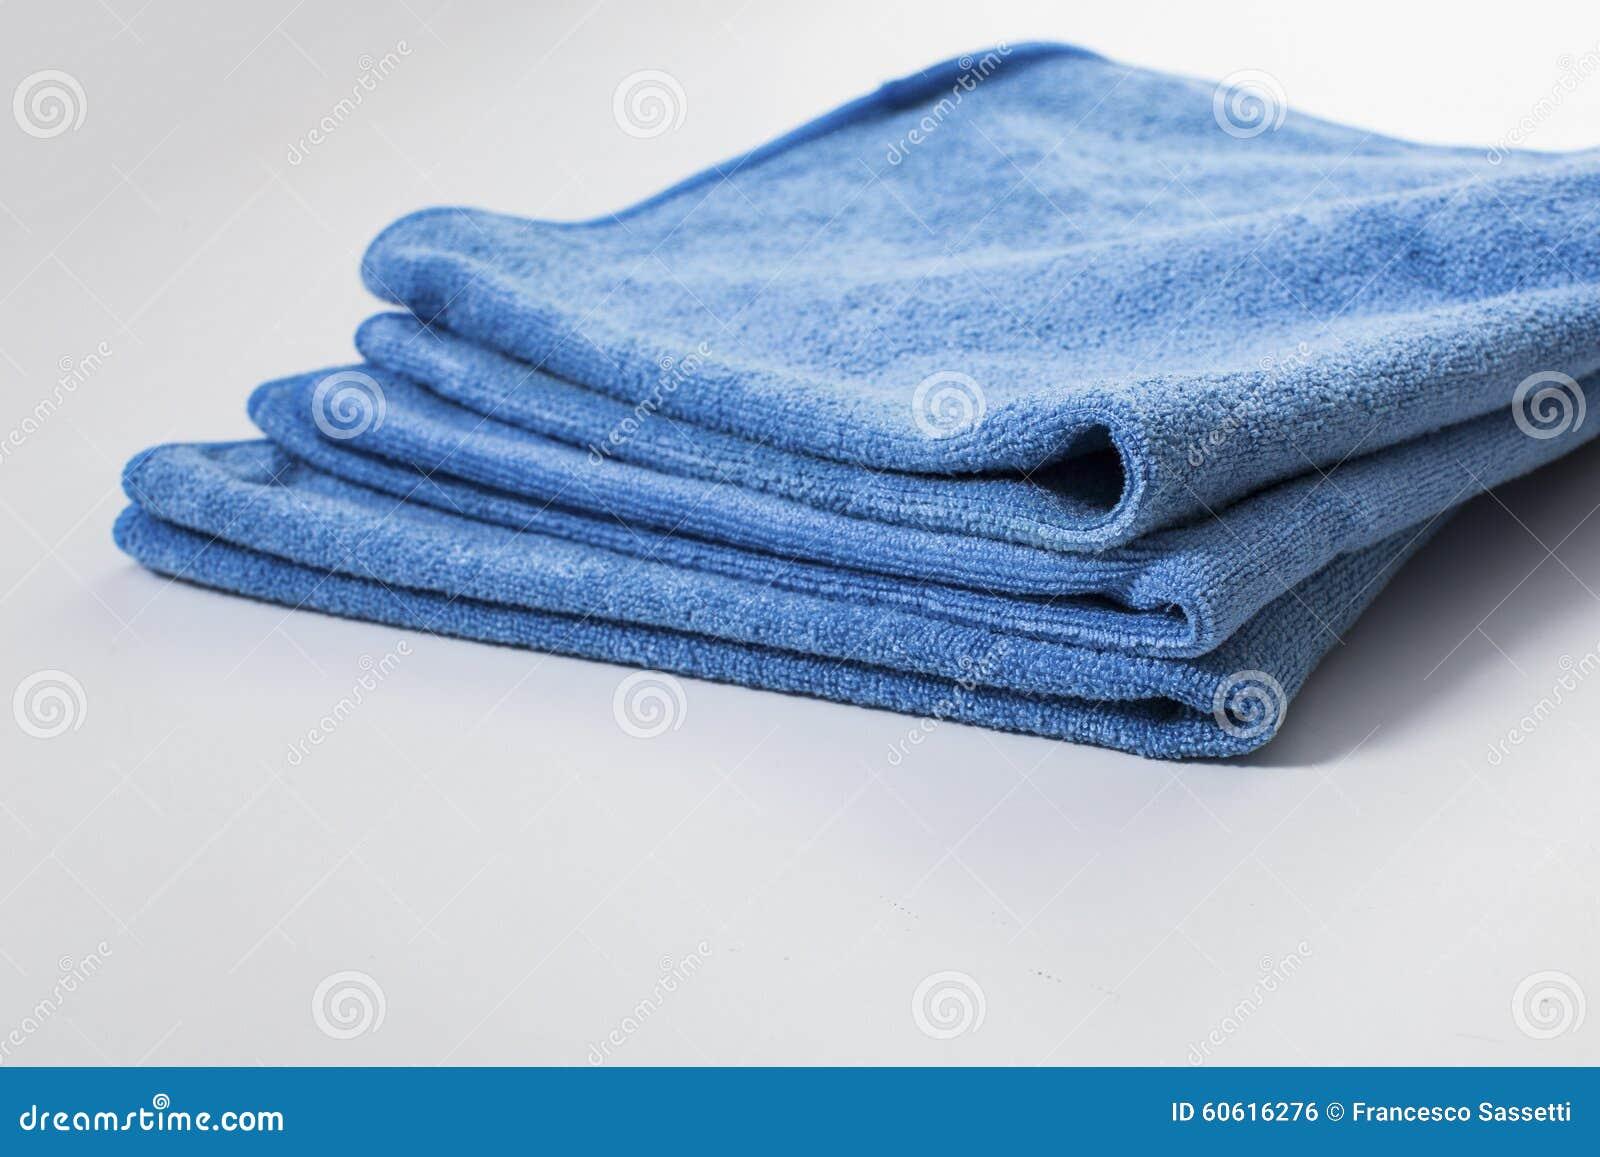 microfiber towel for car wipe stock photo image 60616276. Black Bedroom Furniture Sets. Home Design Ideas